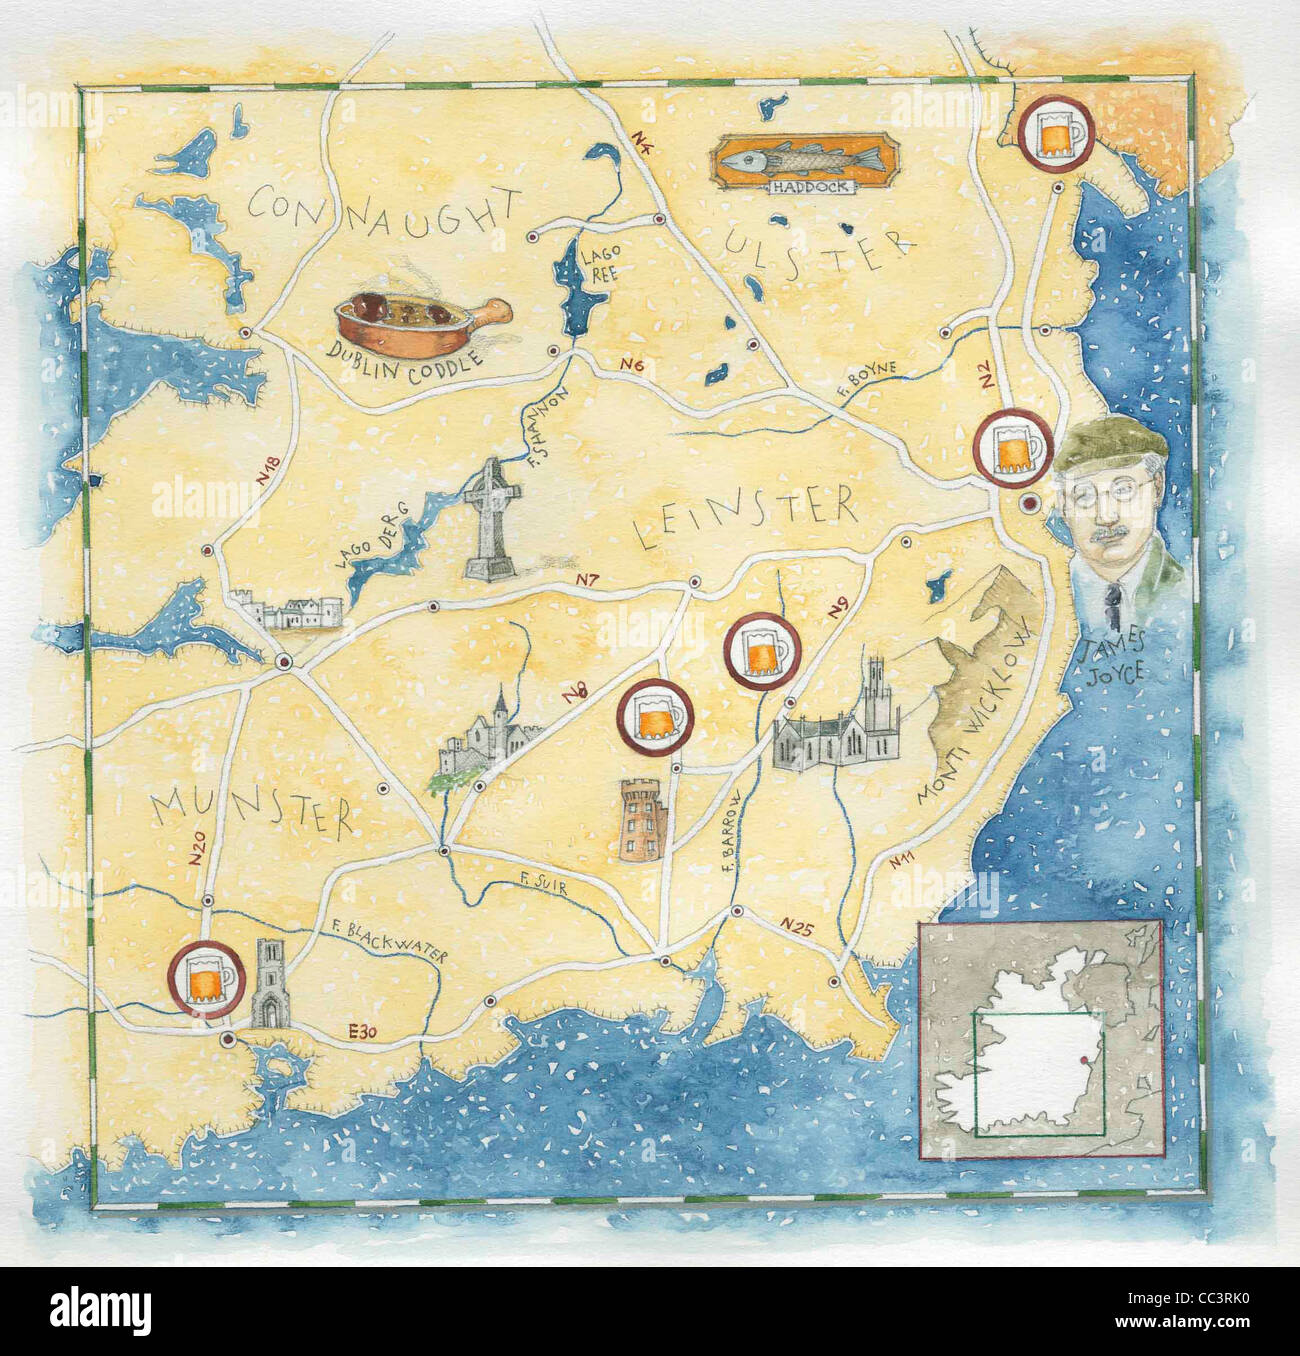 Map Of Ireland Drawing.Map Ireland Drawing Stock Photos Map Ireland Drawing Stock Images